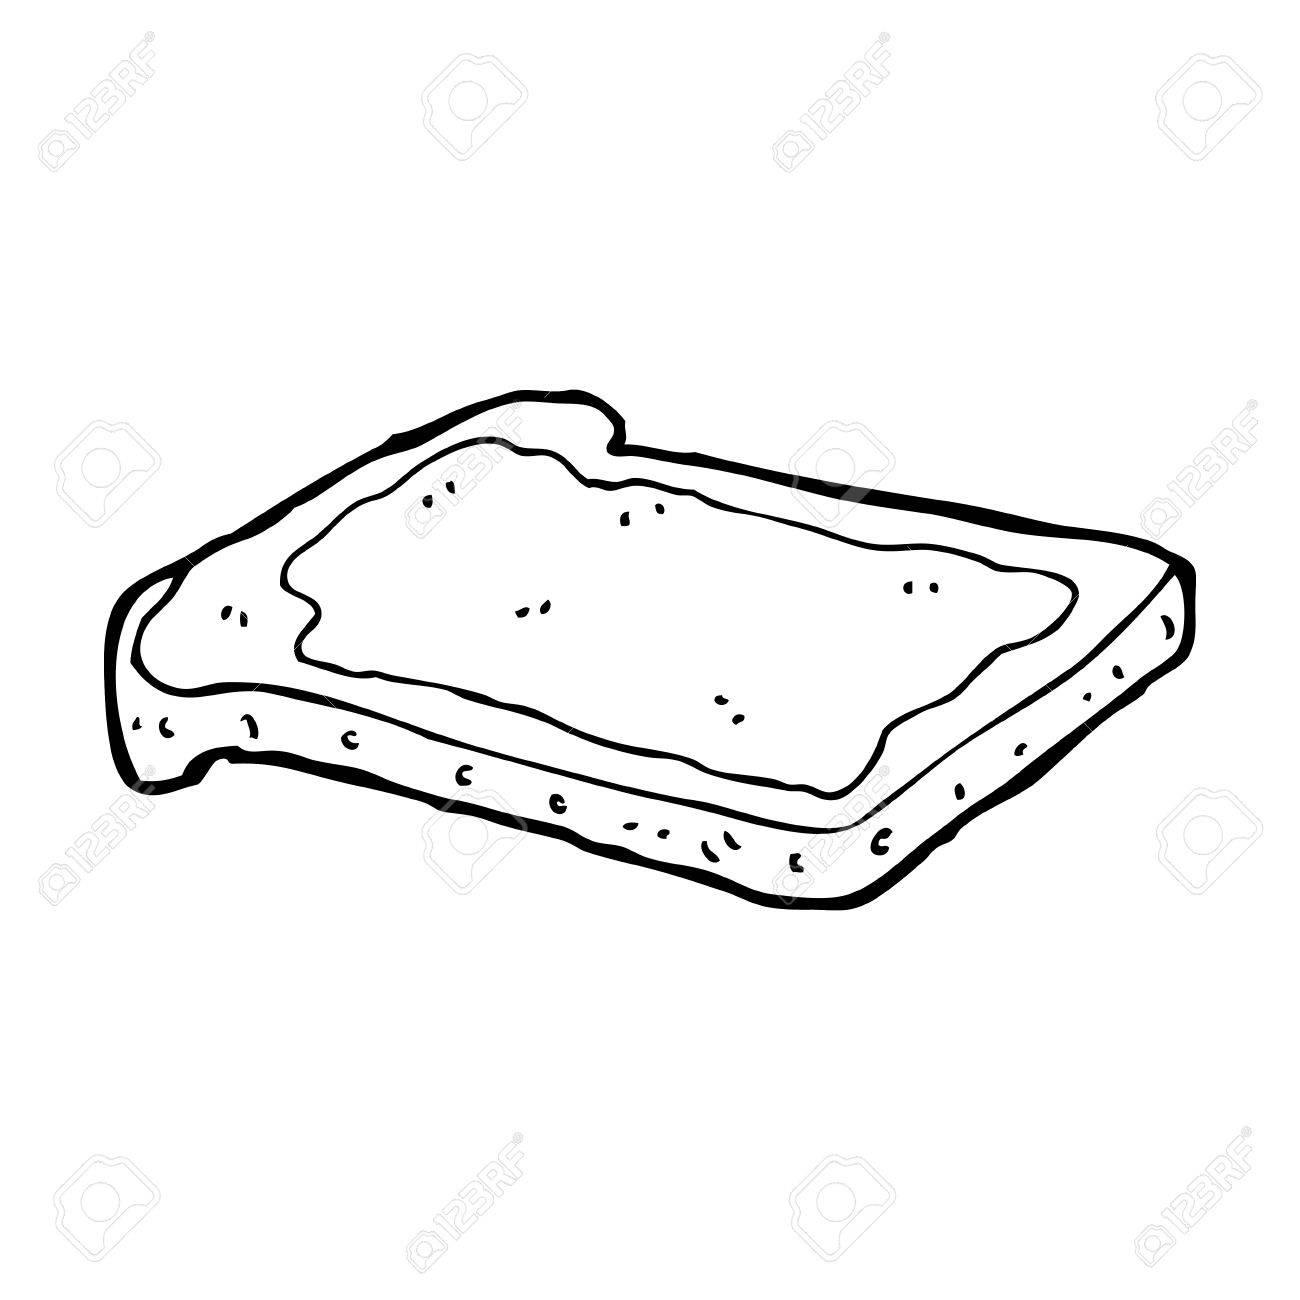 1300x1300 Cartoon Jam On Toast Royalty Free Cliparts, Vectors, And Stock